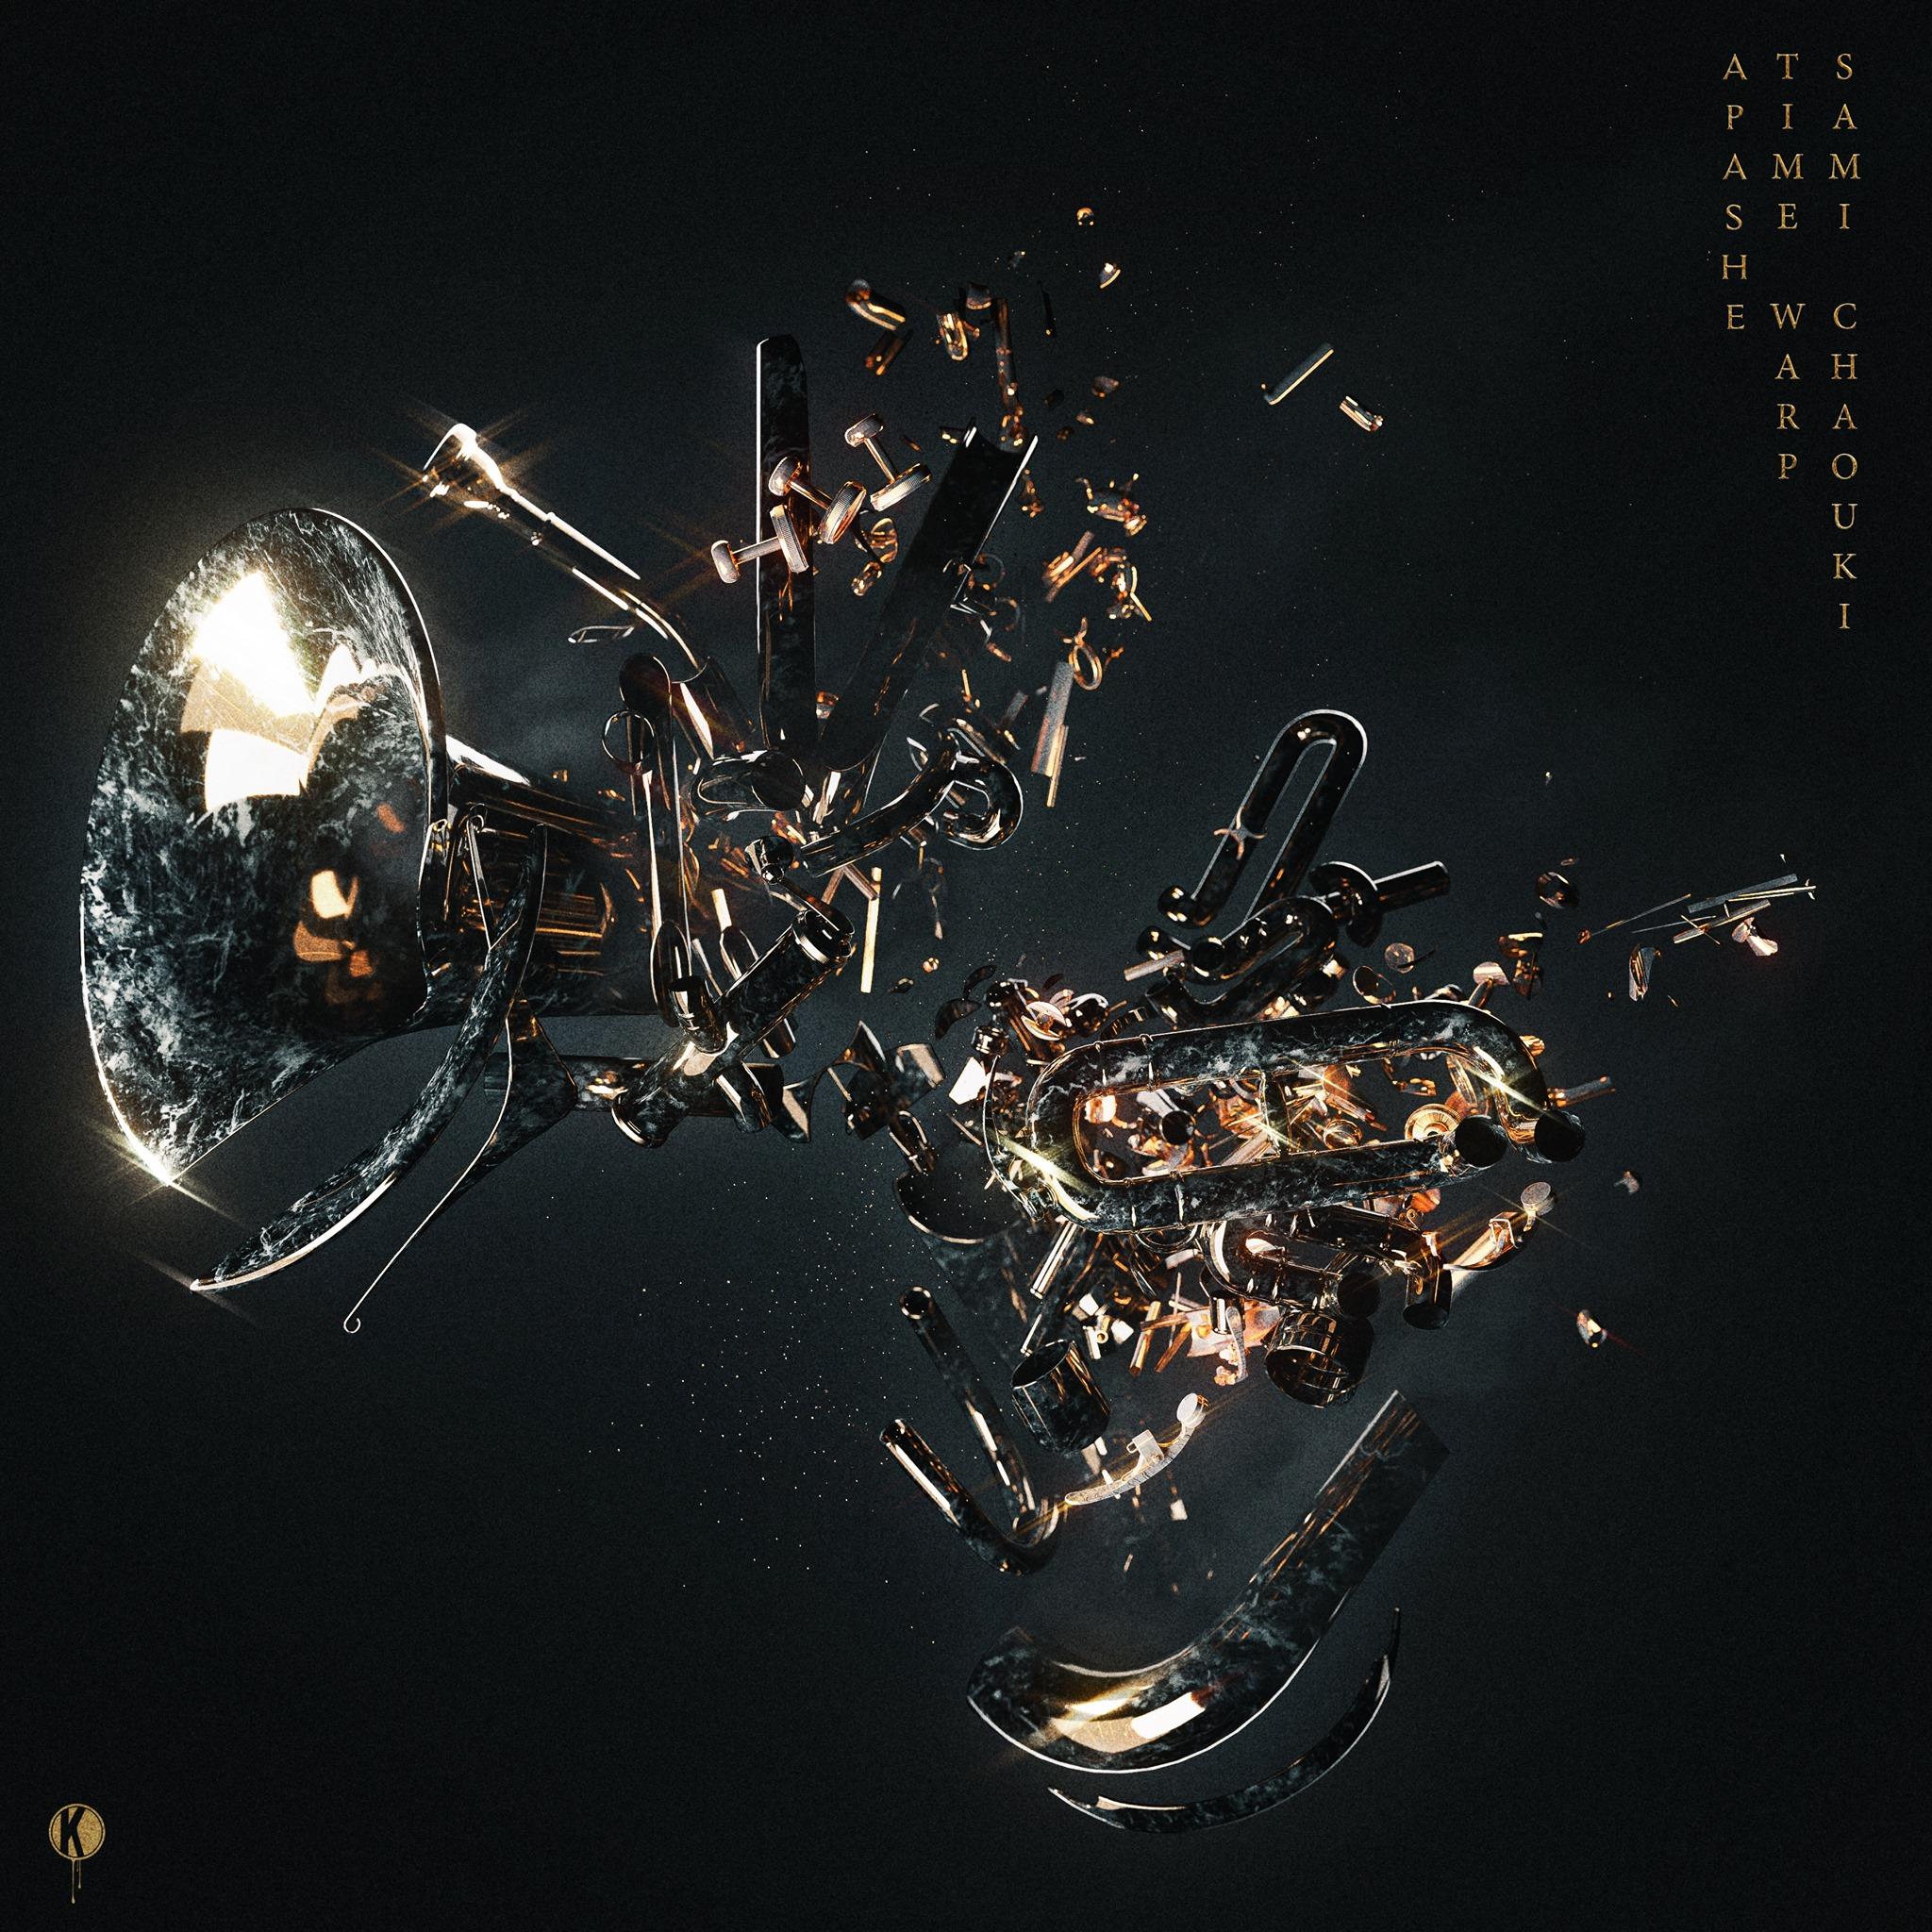 Apashe - Time Wrap (ft. Sami Chaouki) le 18 juin